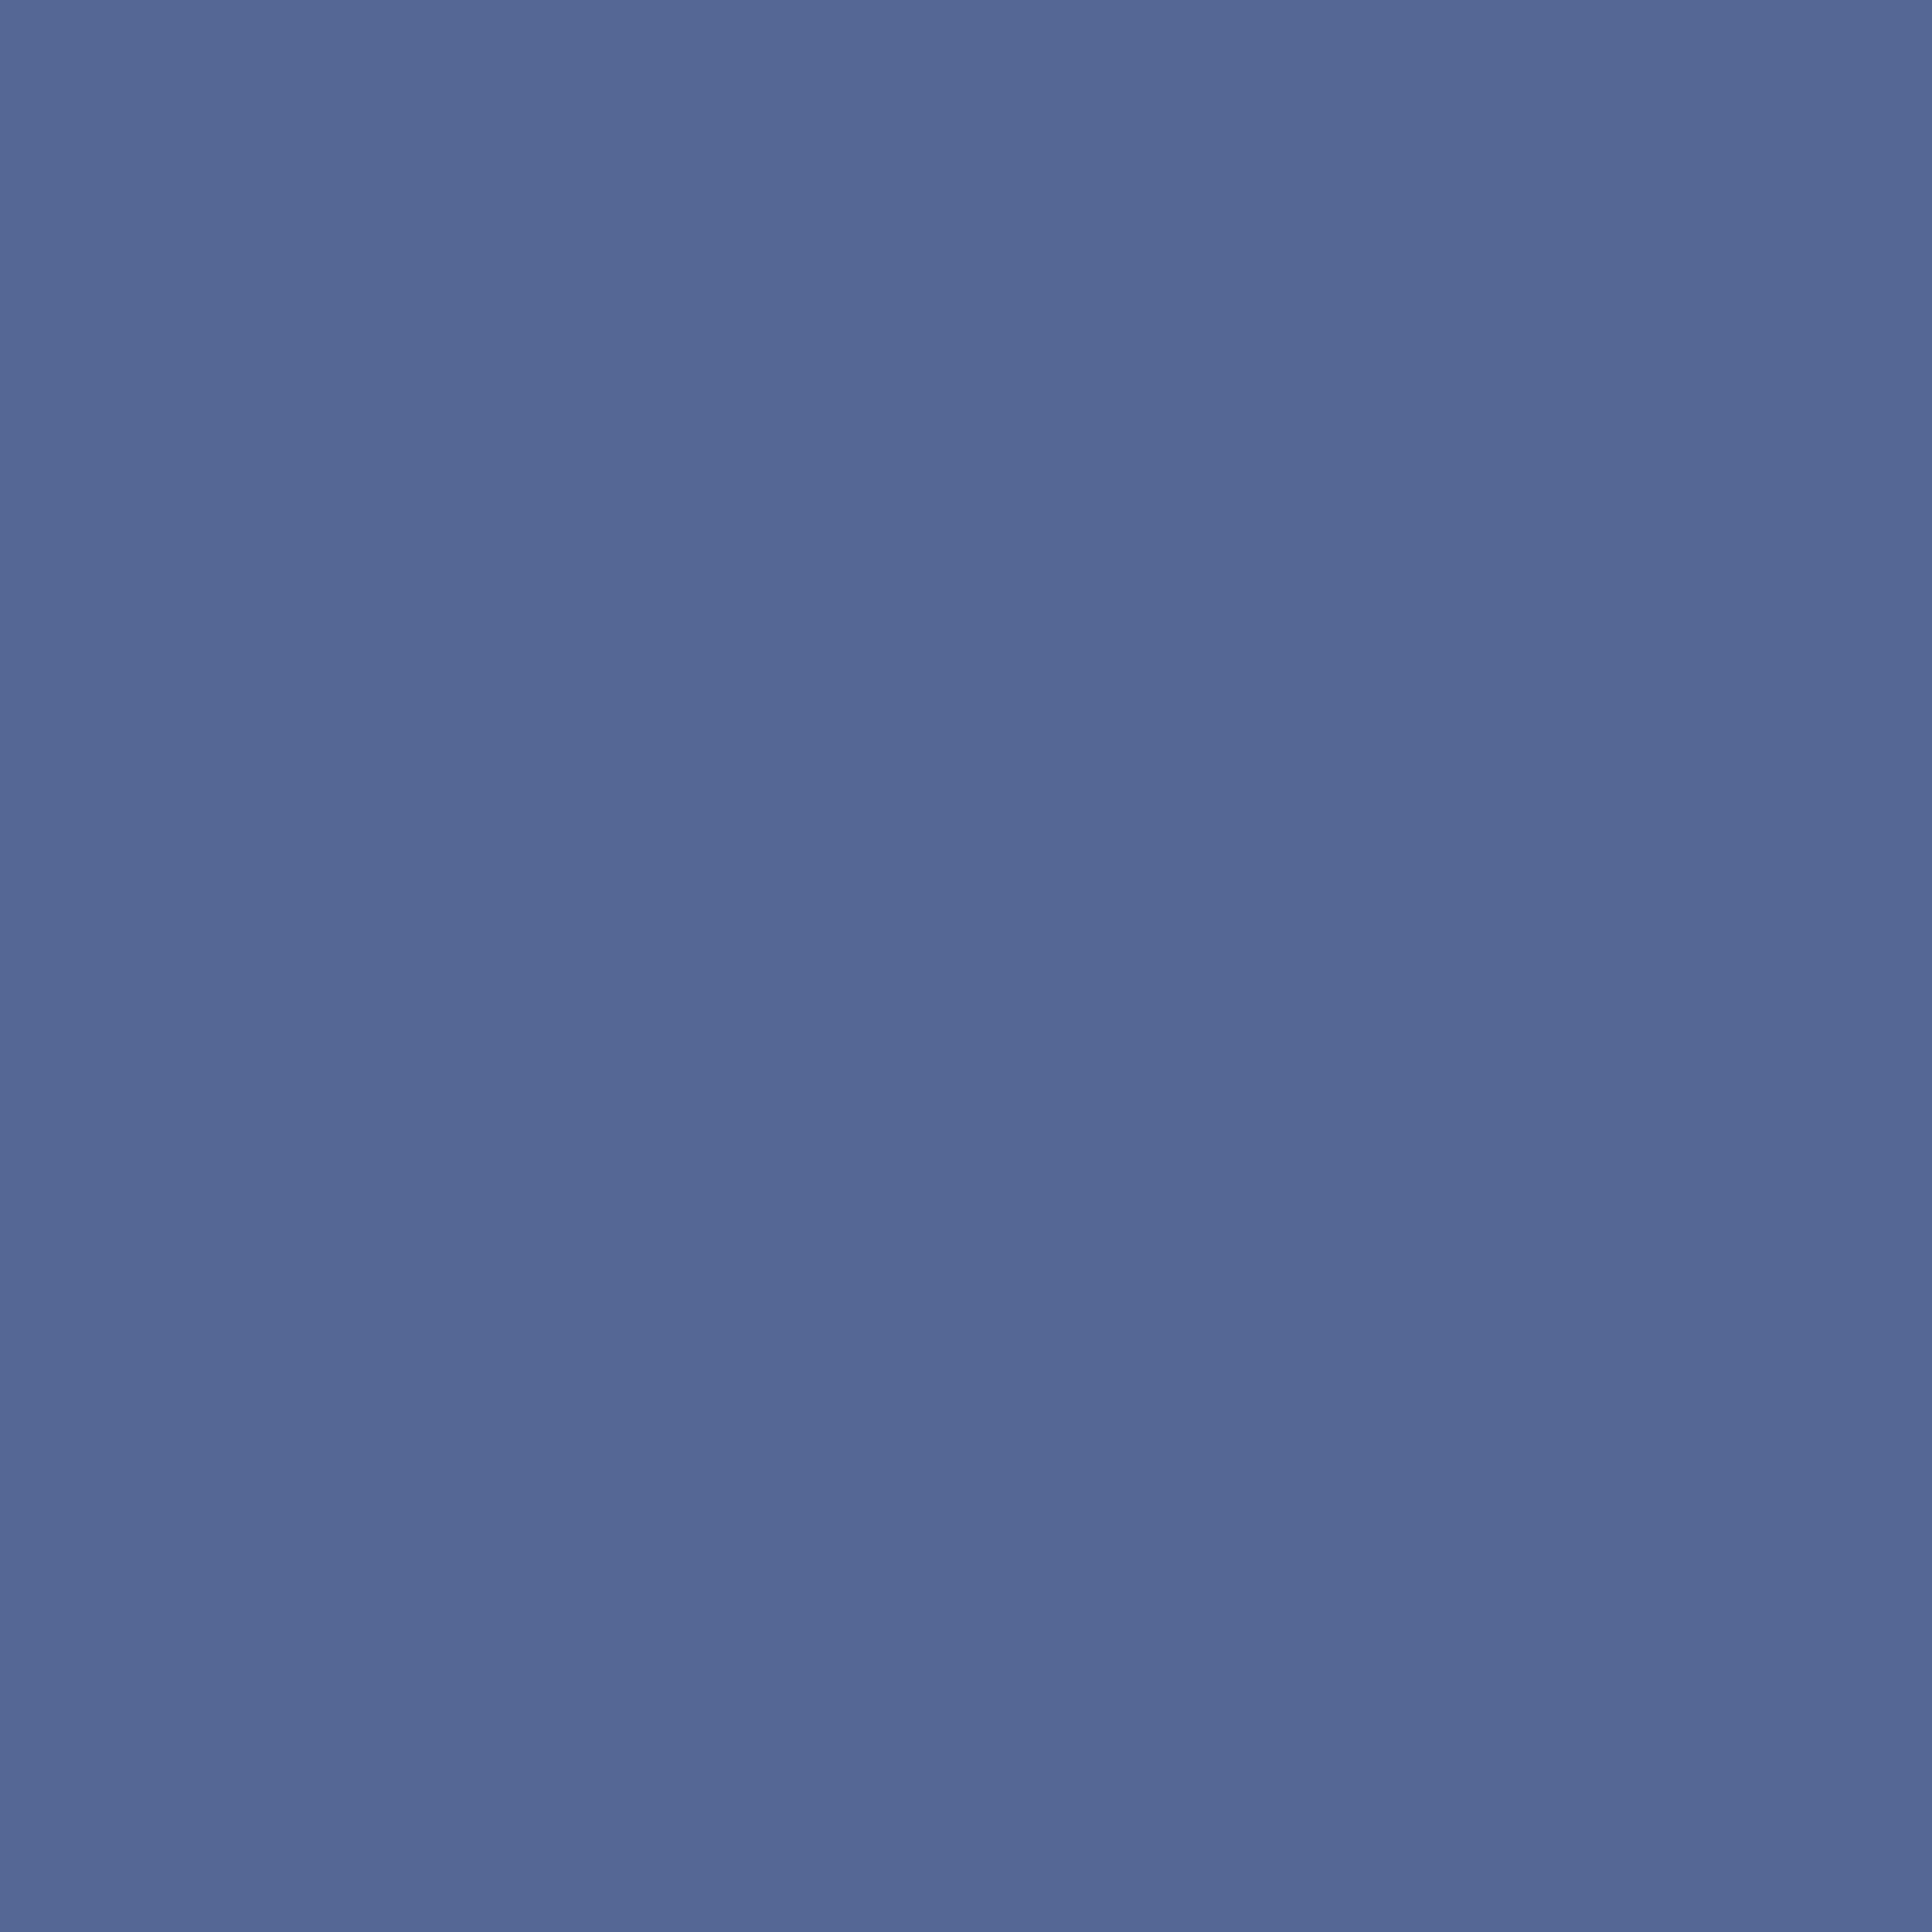 2048x2048 UCLA Blue Solid Color Background